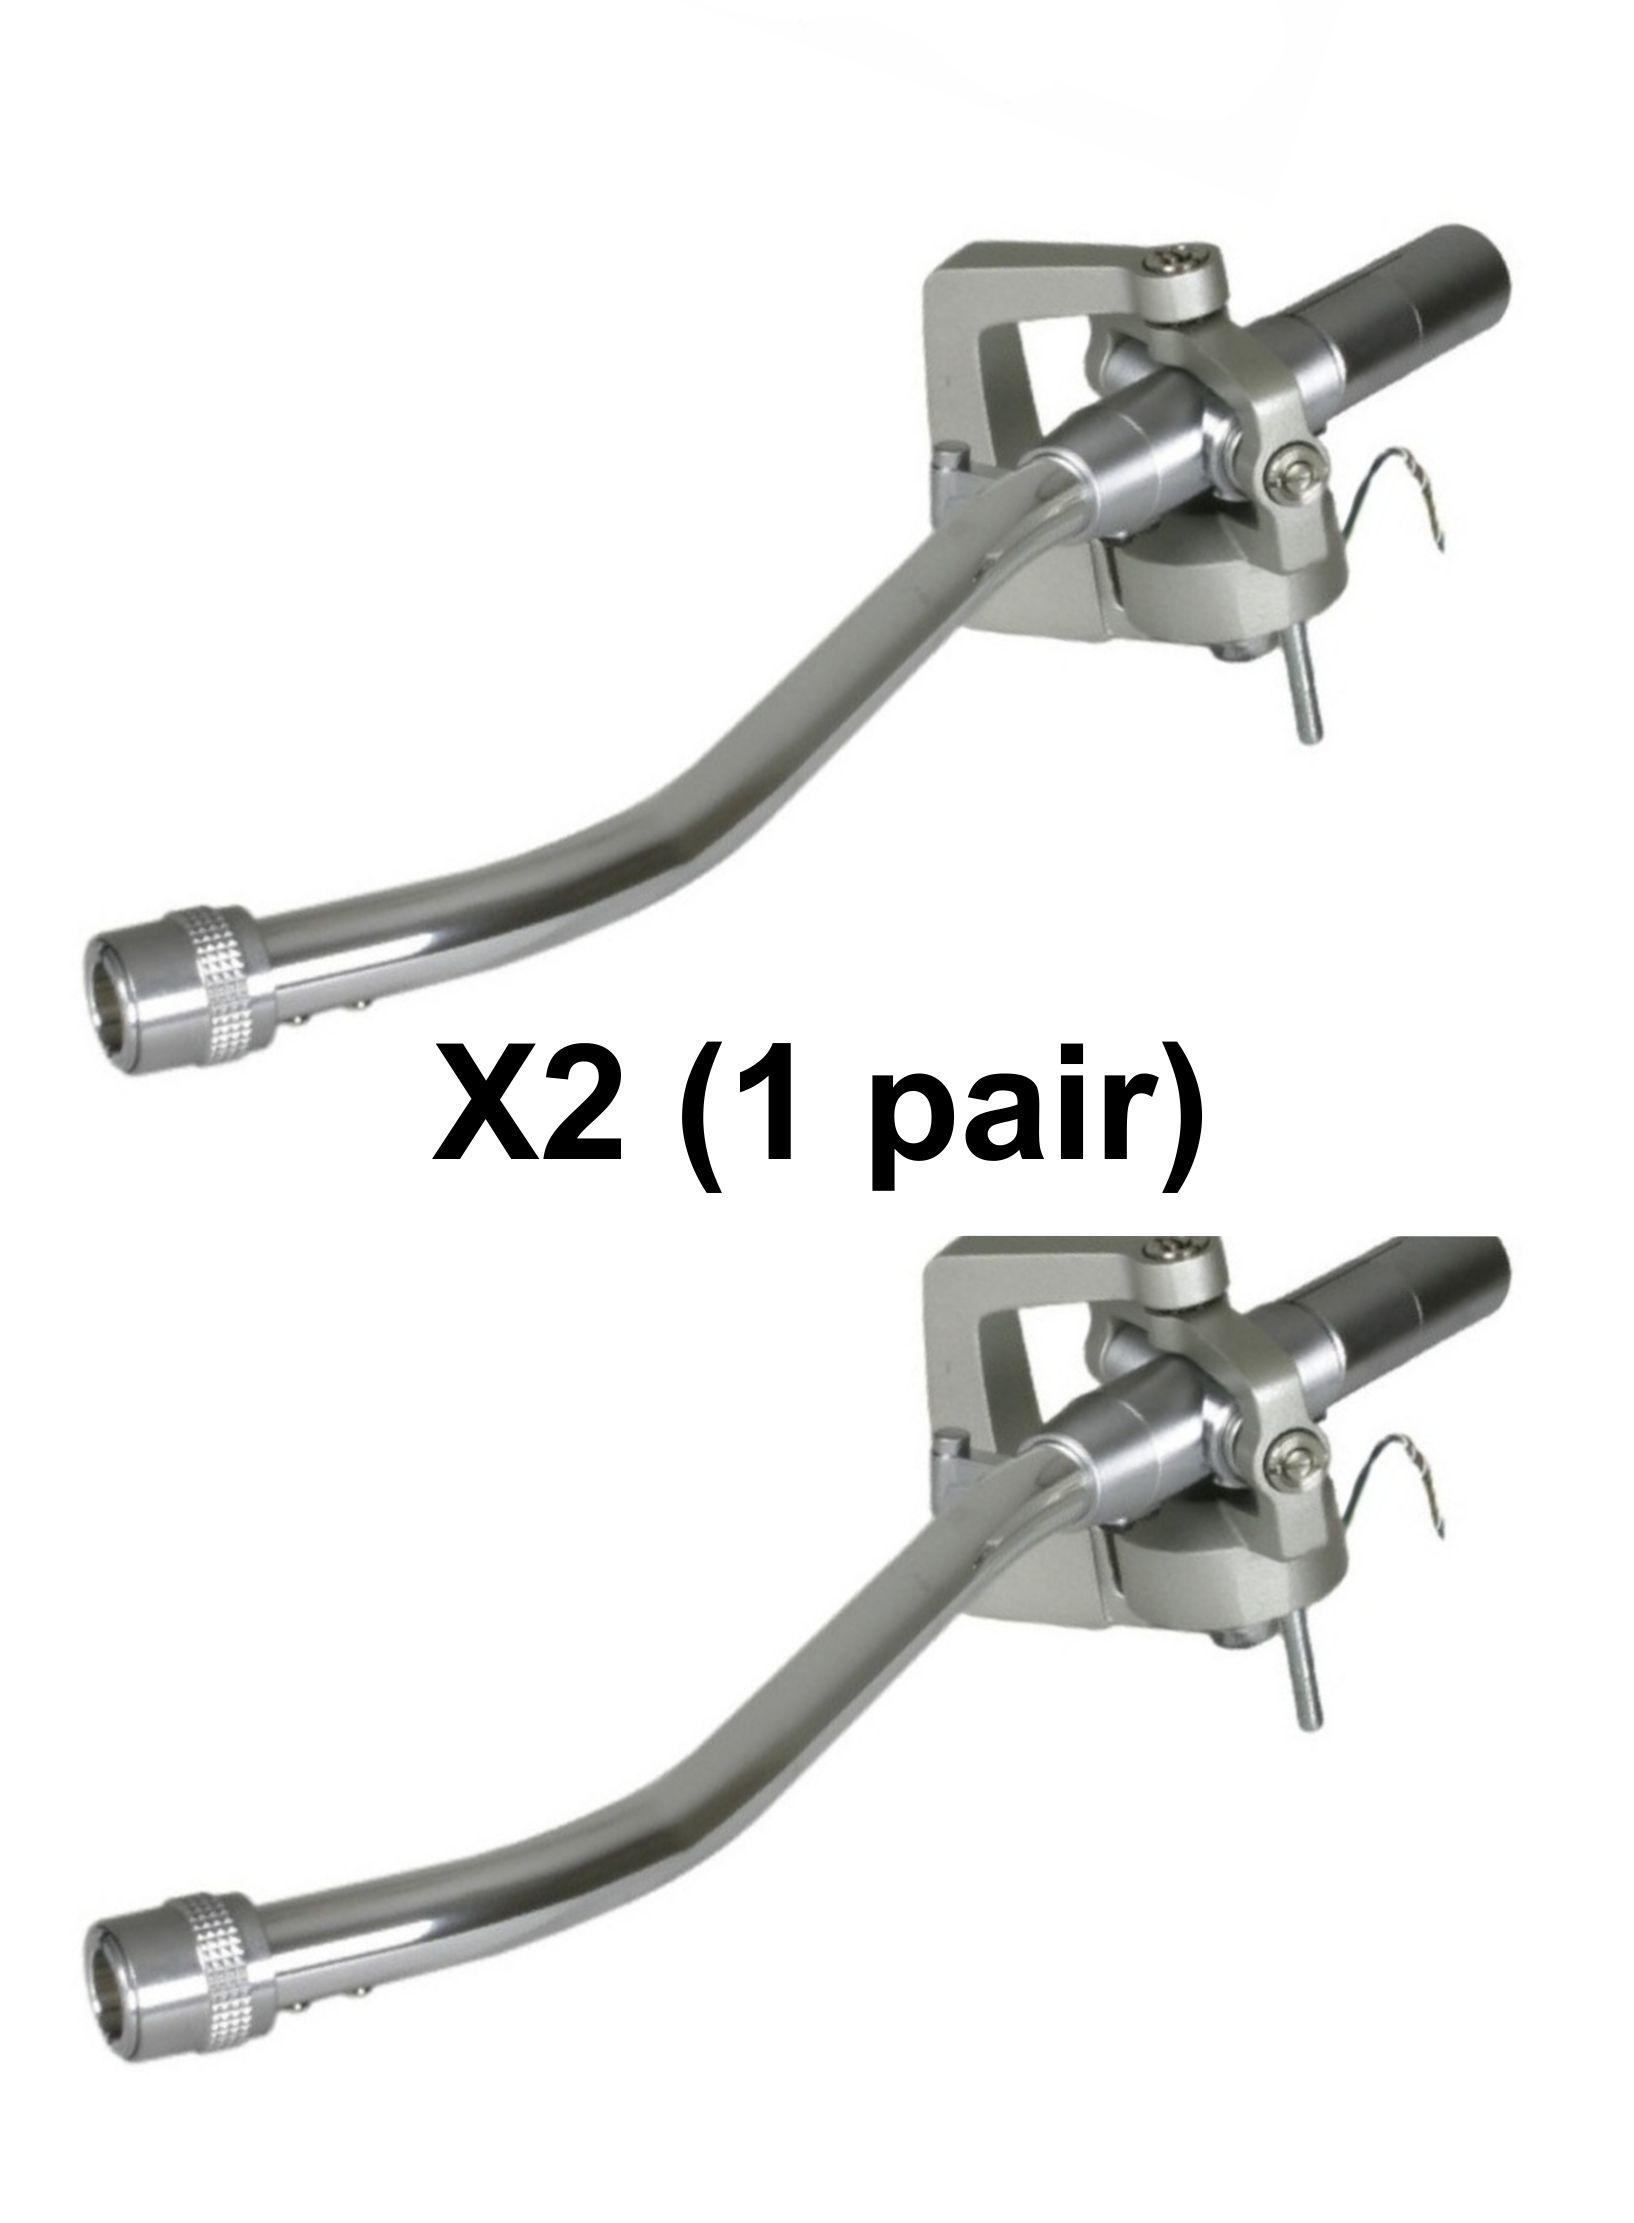 P-AM18201K1 1200 PAIR Tonearm (Silver) Brand New